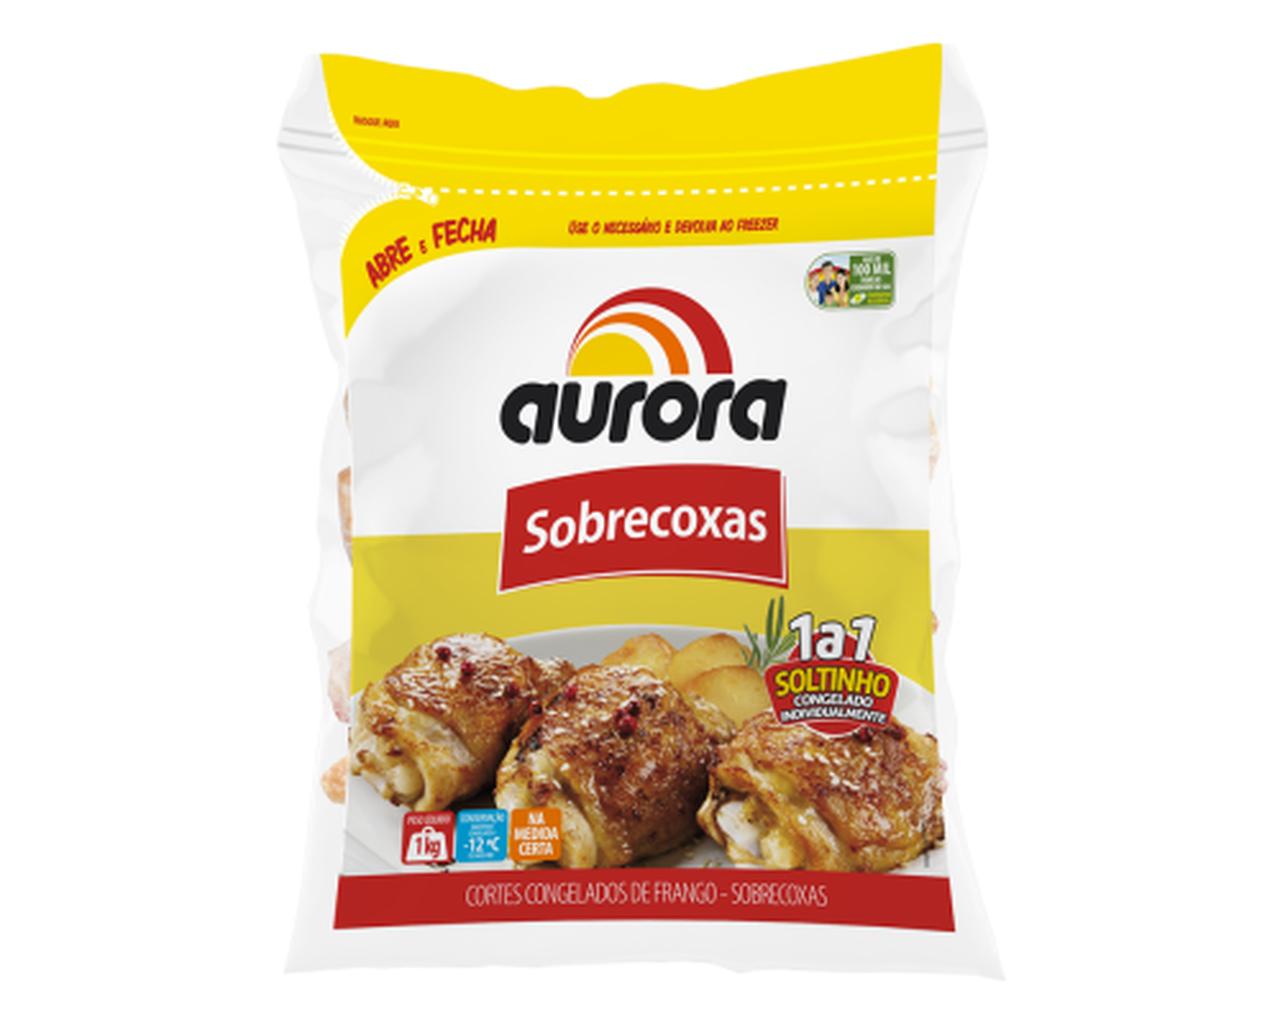 PACOTE SOBRECOXAS AURORA 1KG  - JJPIVOTTO - Comercio de Frutas